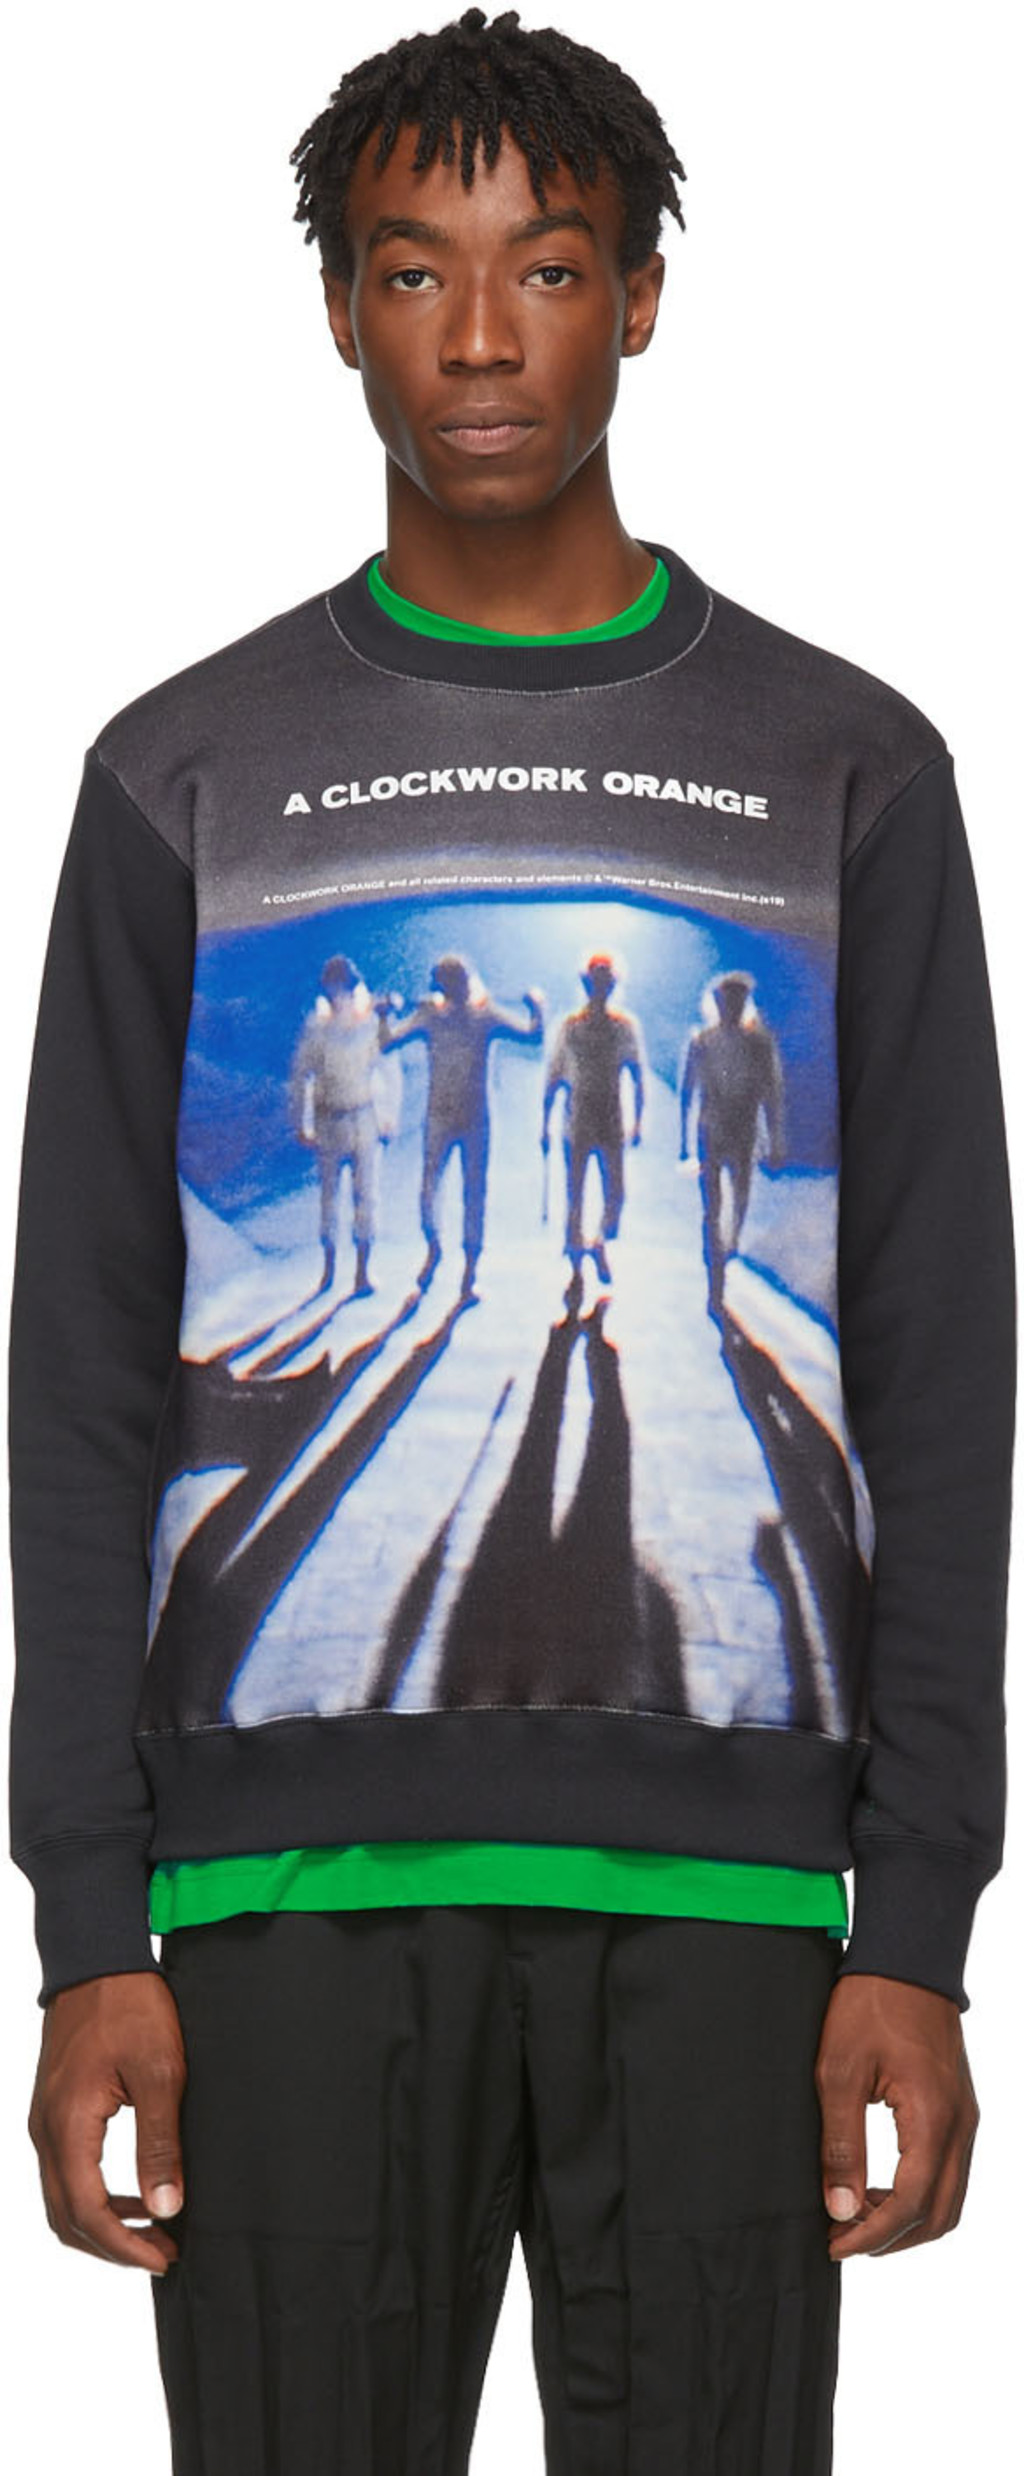 774d6f3fec Black A Clockwork Orange Edition Sweatshirt